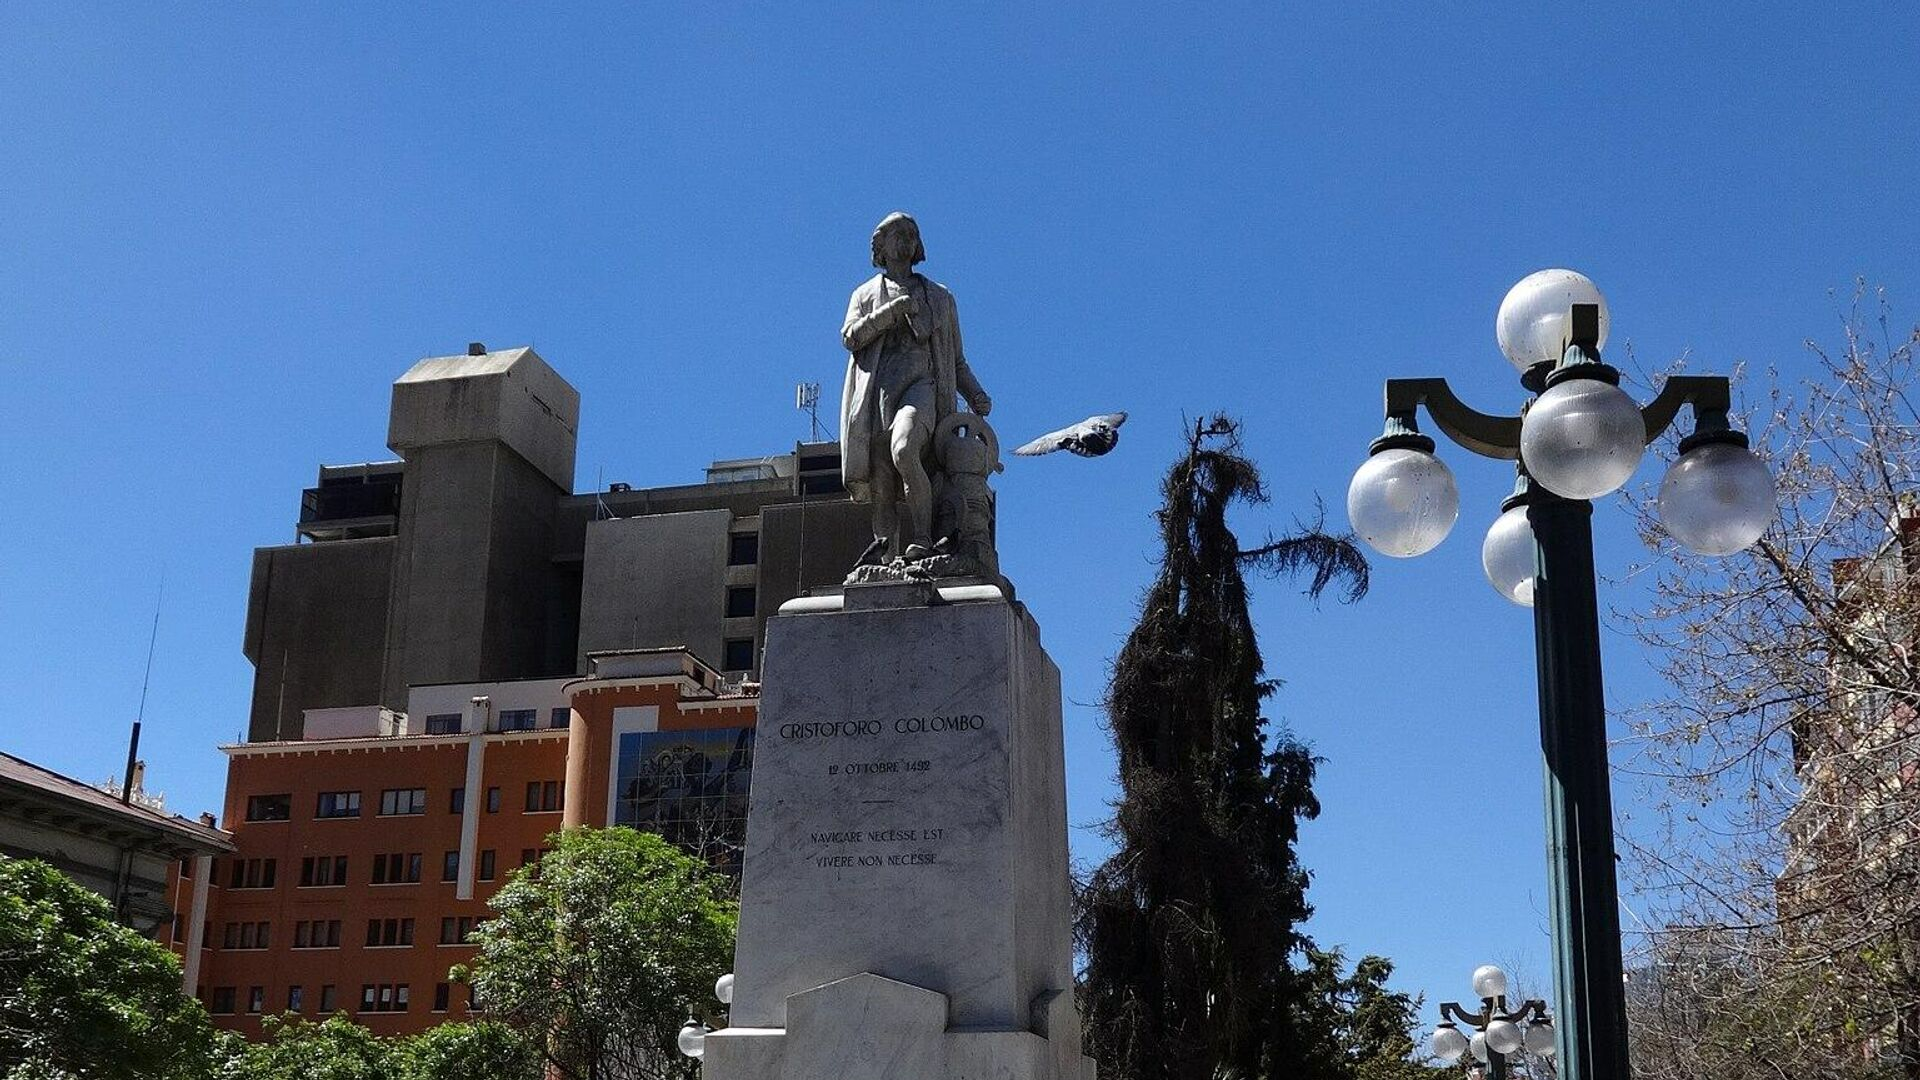 Monumento a Cristóbal Colónen el Paseo del Prado, La Paz, Bolivia - Sputnik Mundo, 1920, 01.07.2021